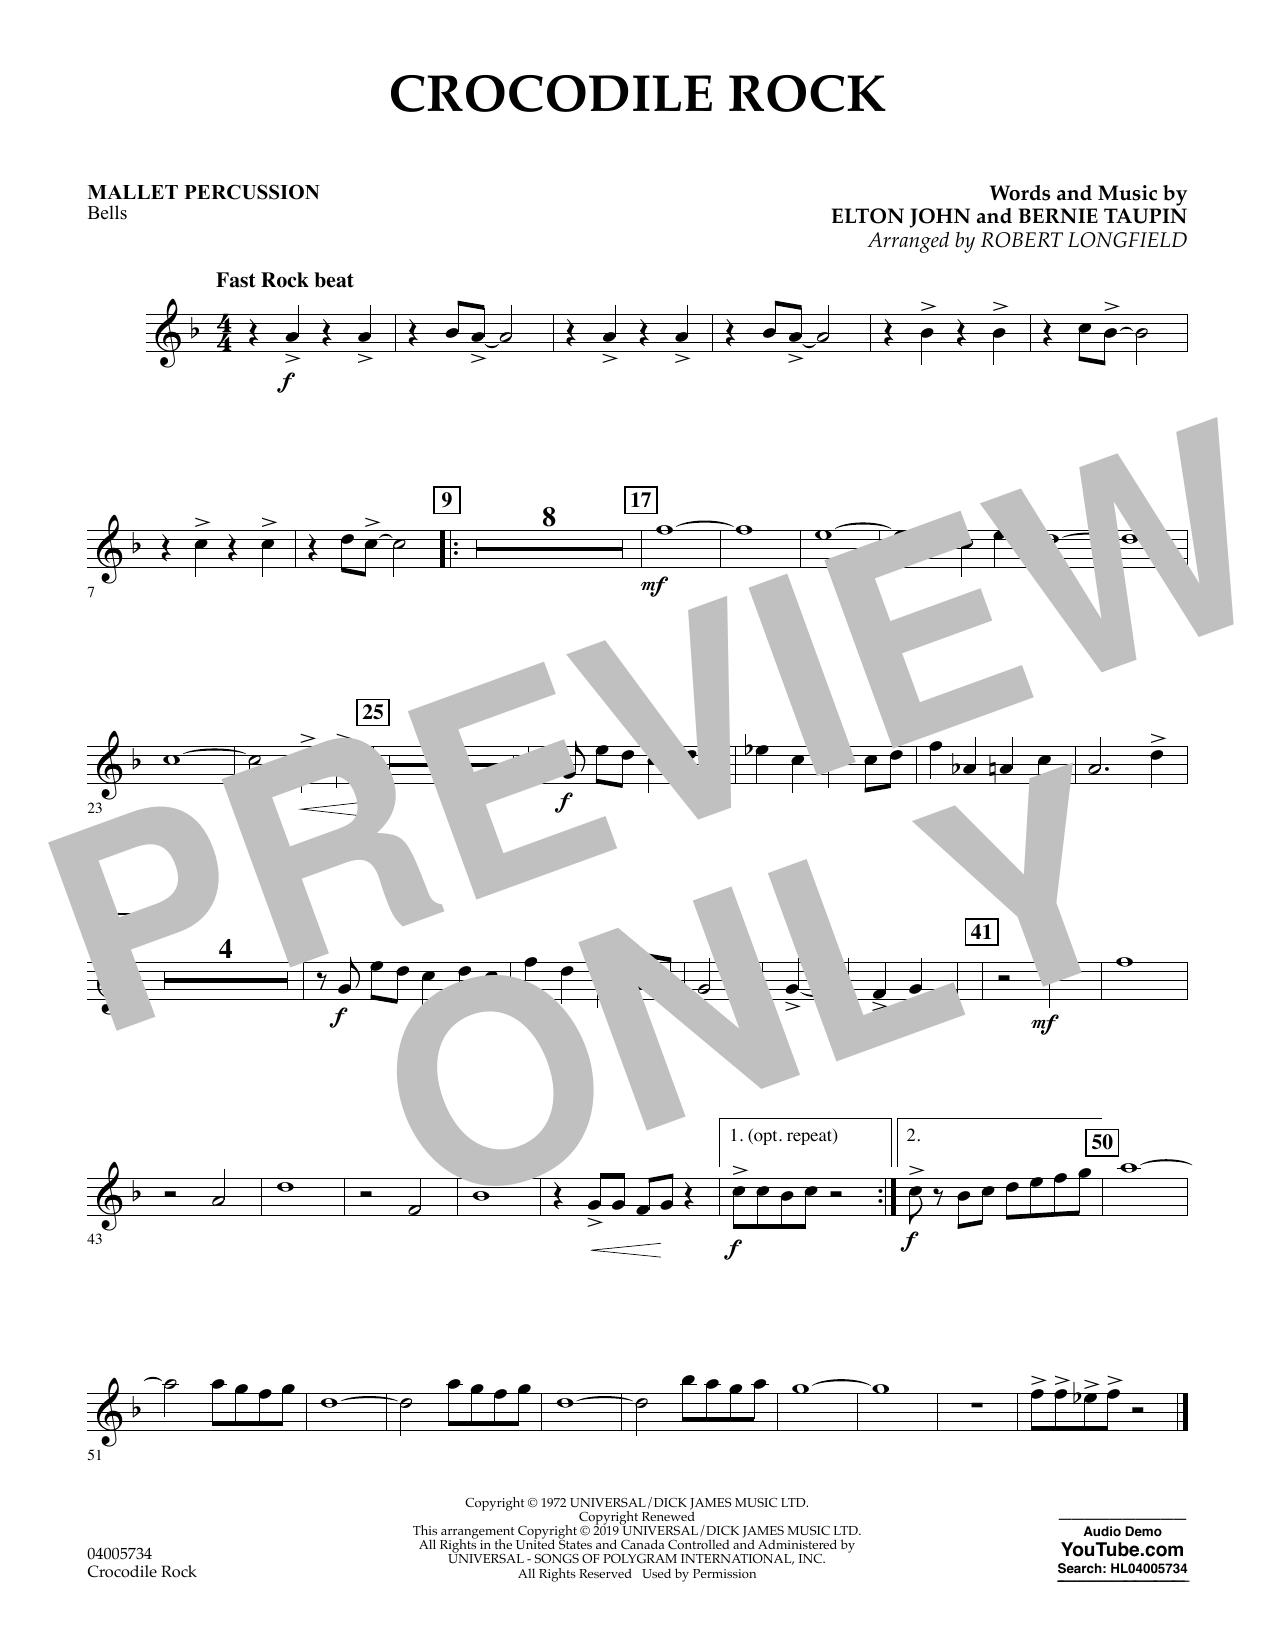 Crocodile Rock (arr. Robert Longfield) - Mallet Percussion (Concert Band)